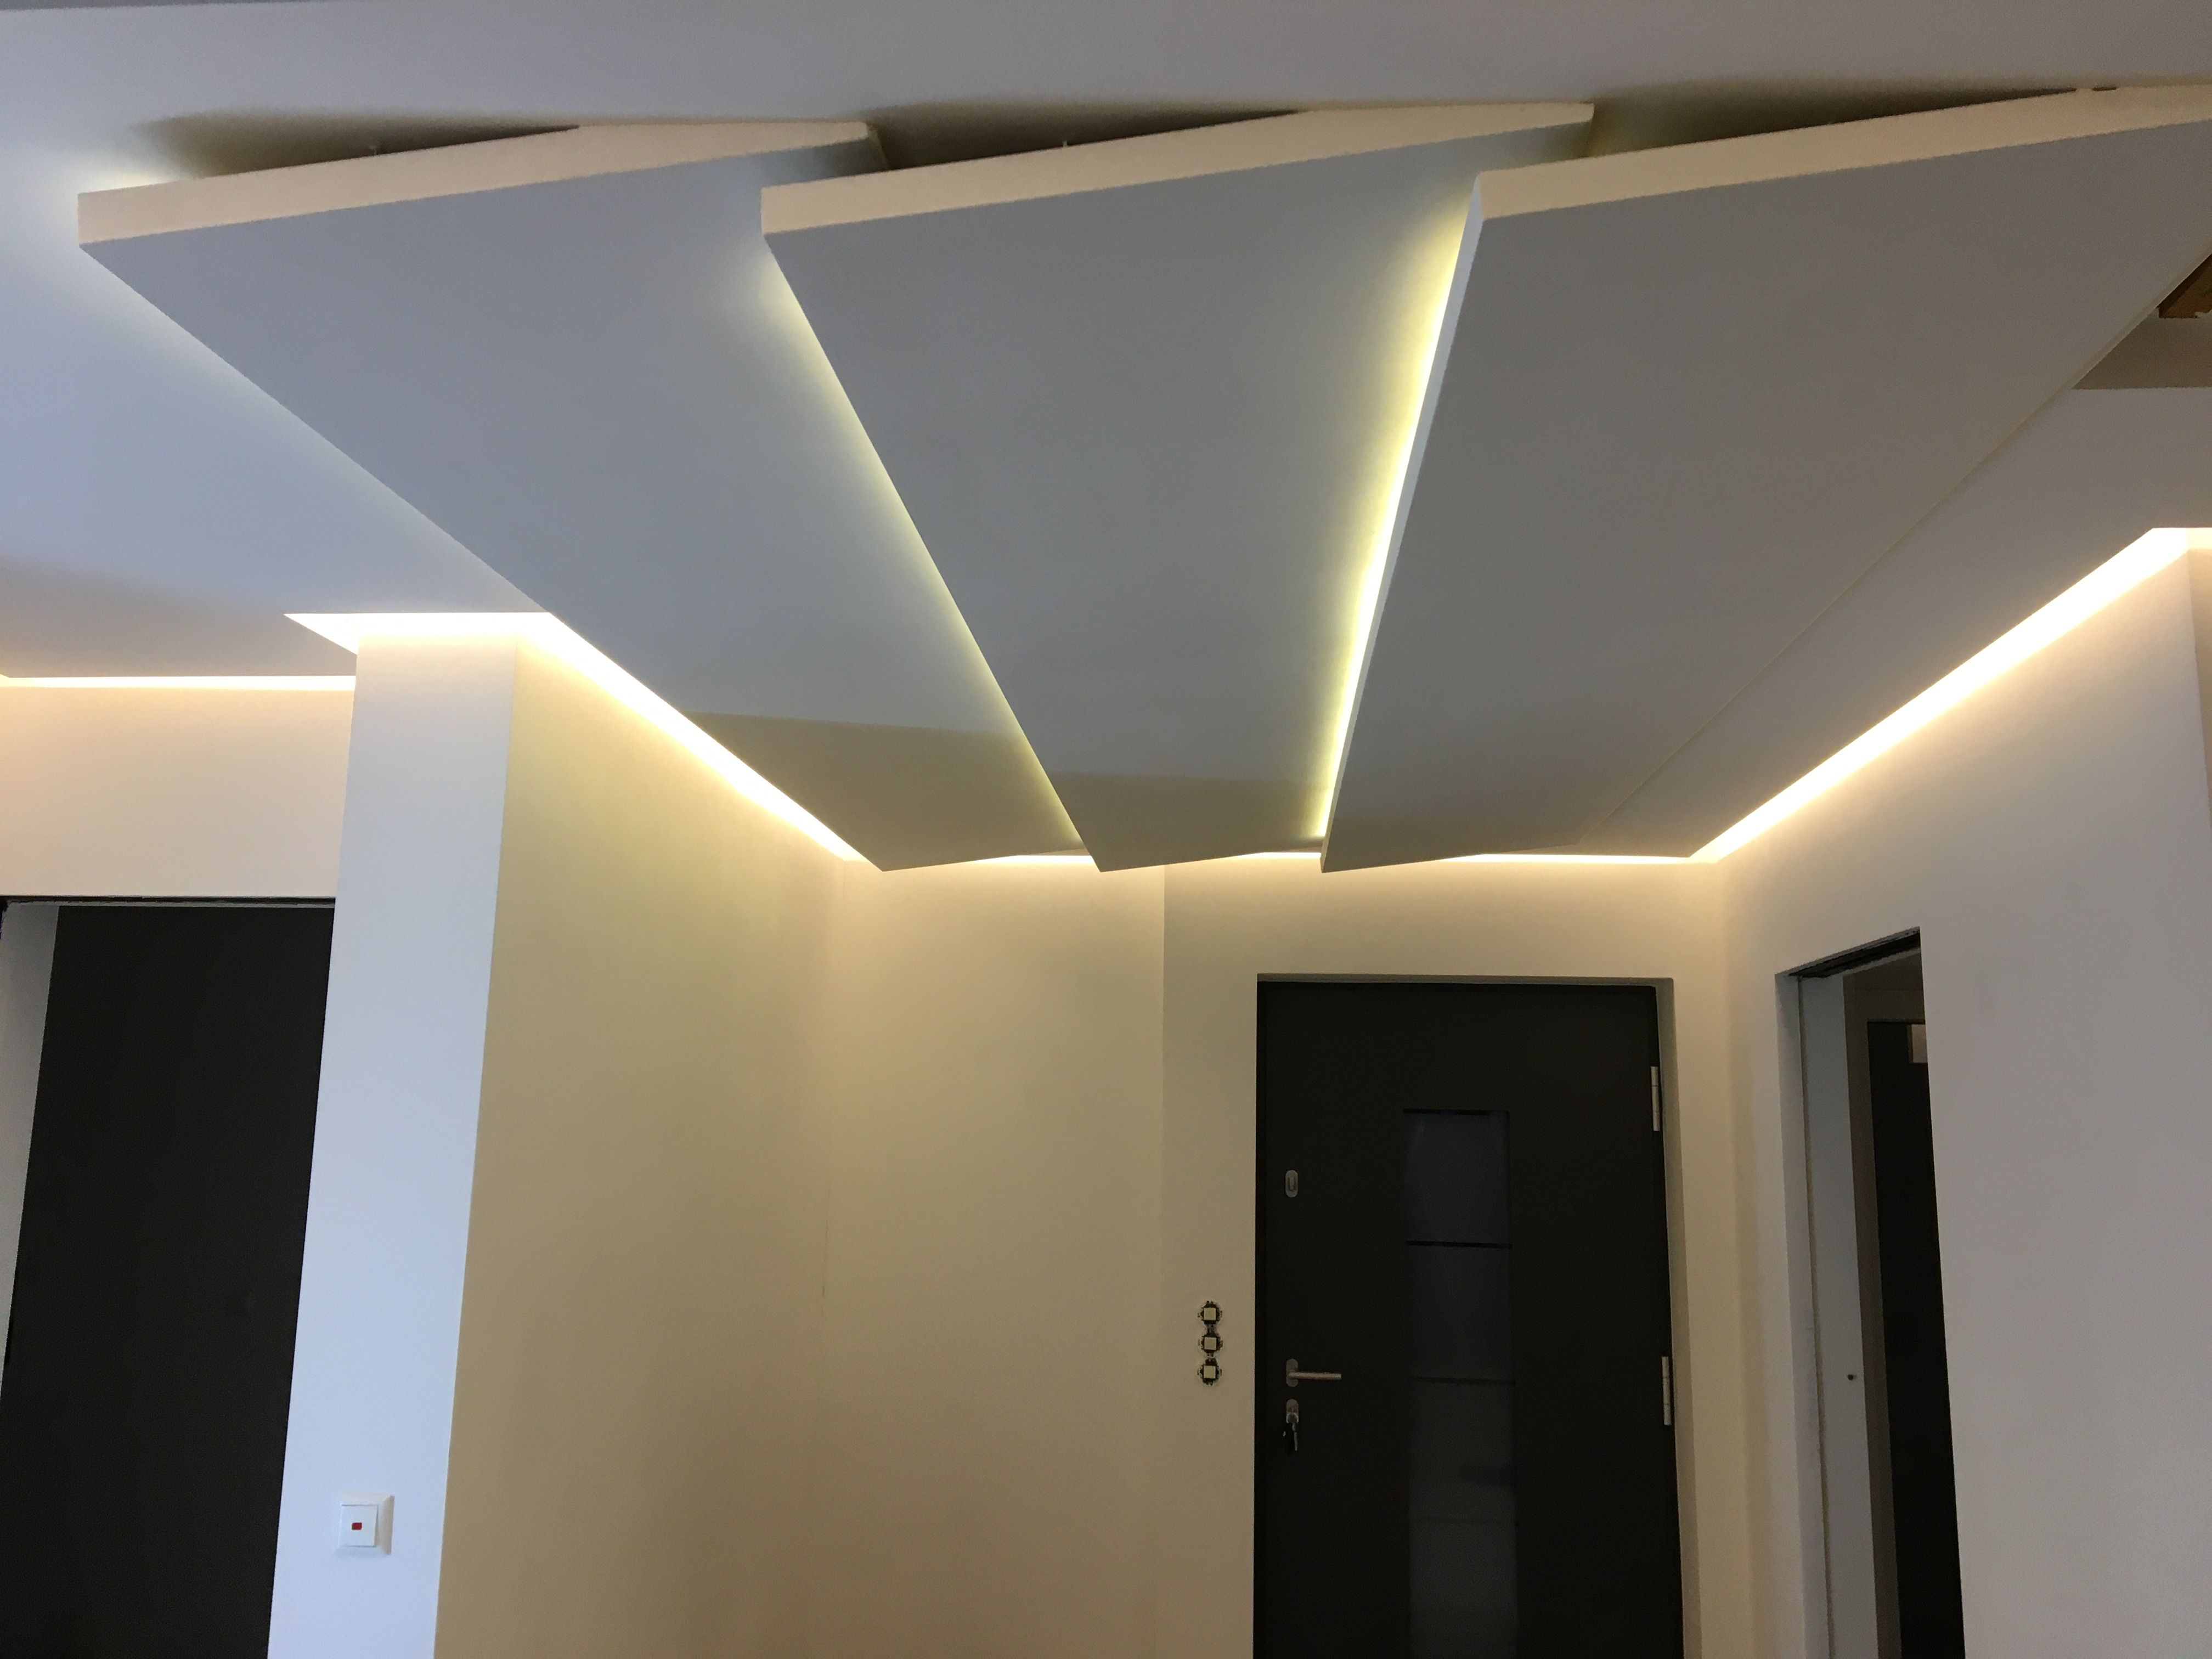 Deckenbeleuchtung Led Indirekt In 2020 Beleuchtung Indirekte Beleuchtung Led